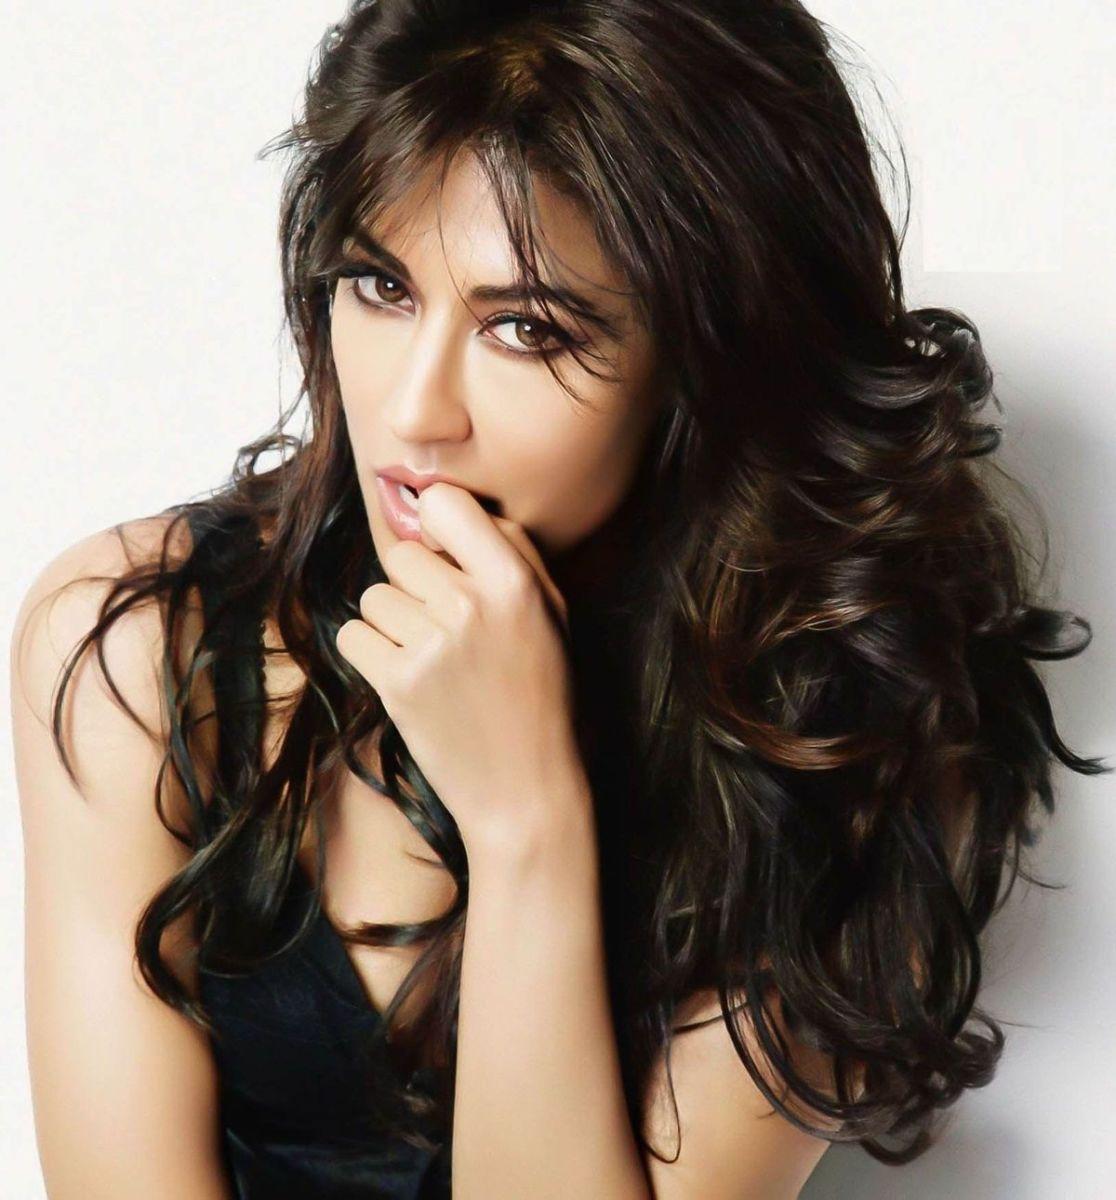 Indian actress Chitrangada Singh